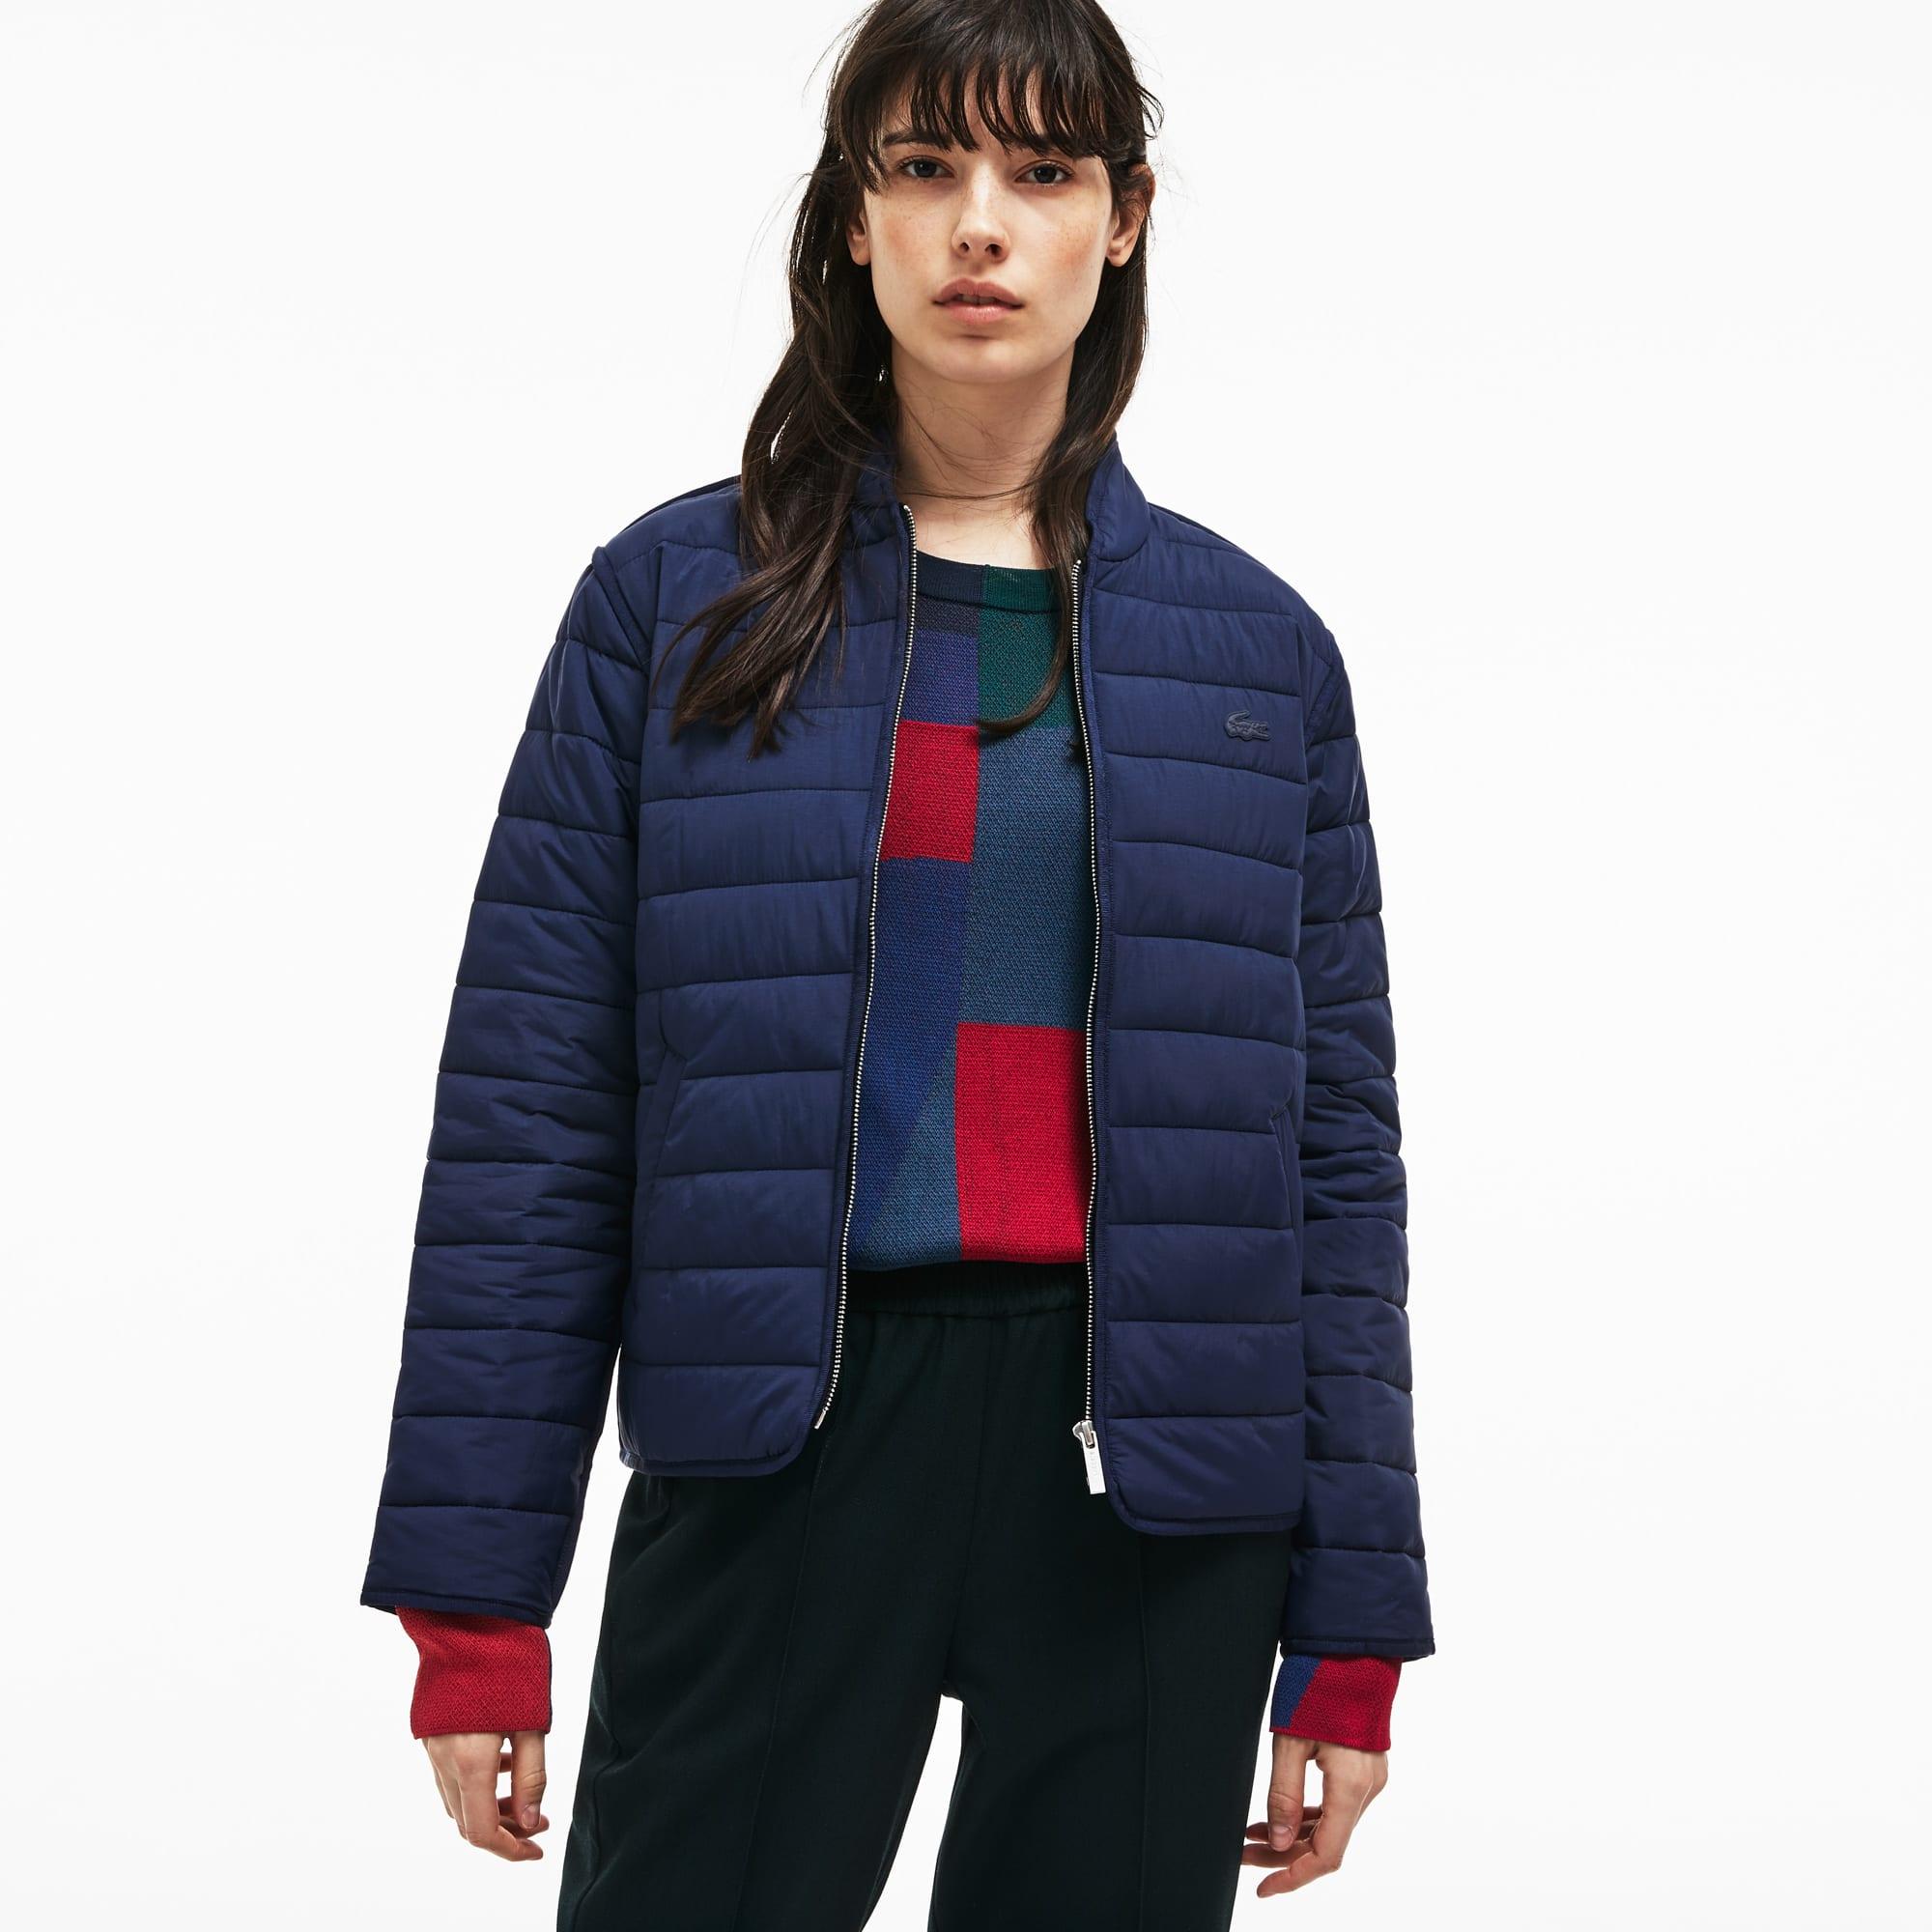 Women s Zippered Quilted Soft Taffeta Jacket ... 64f28177e3